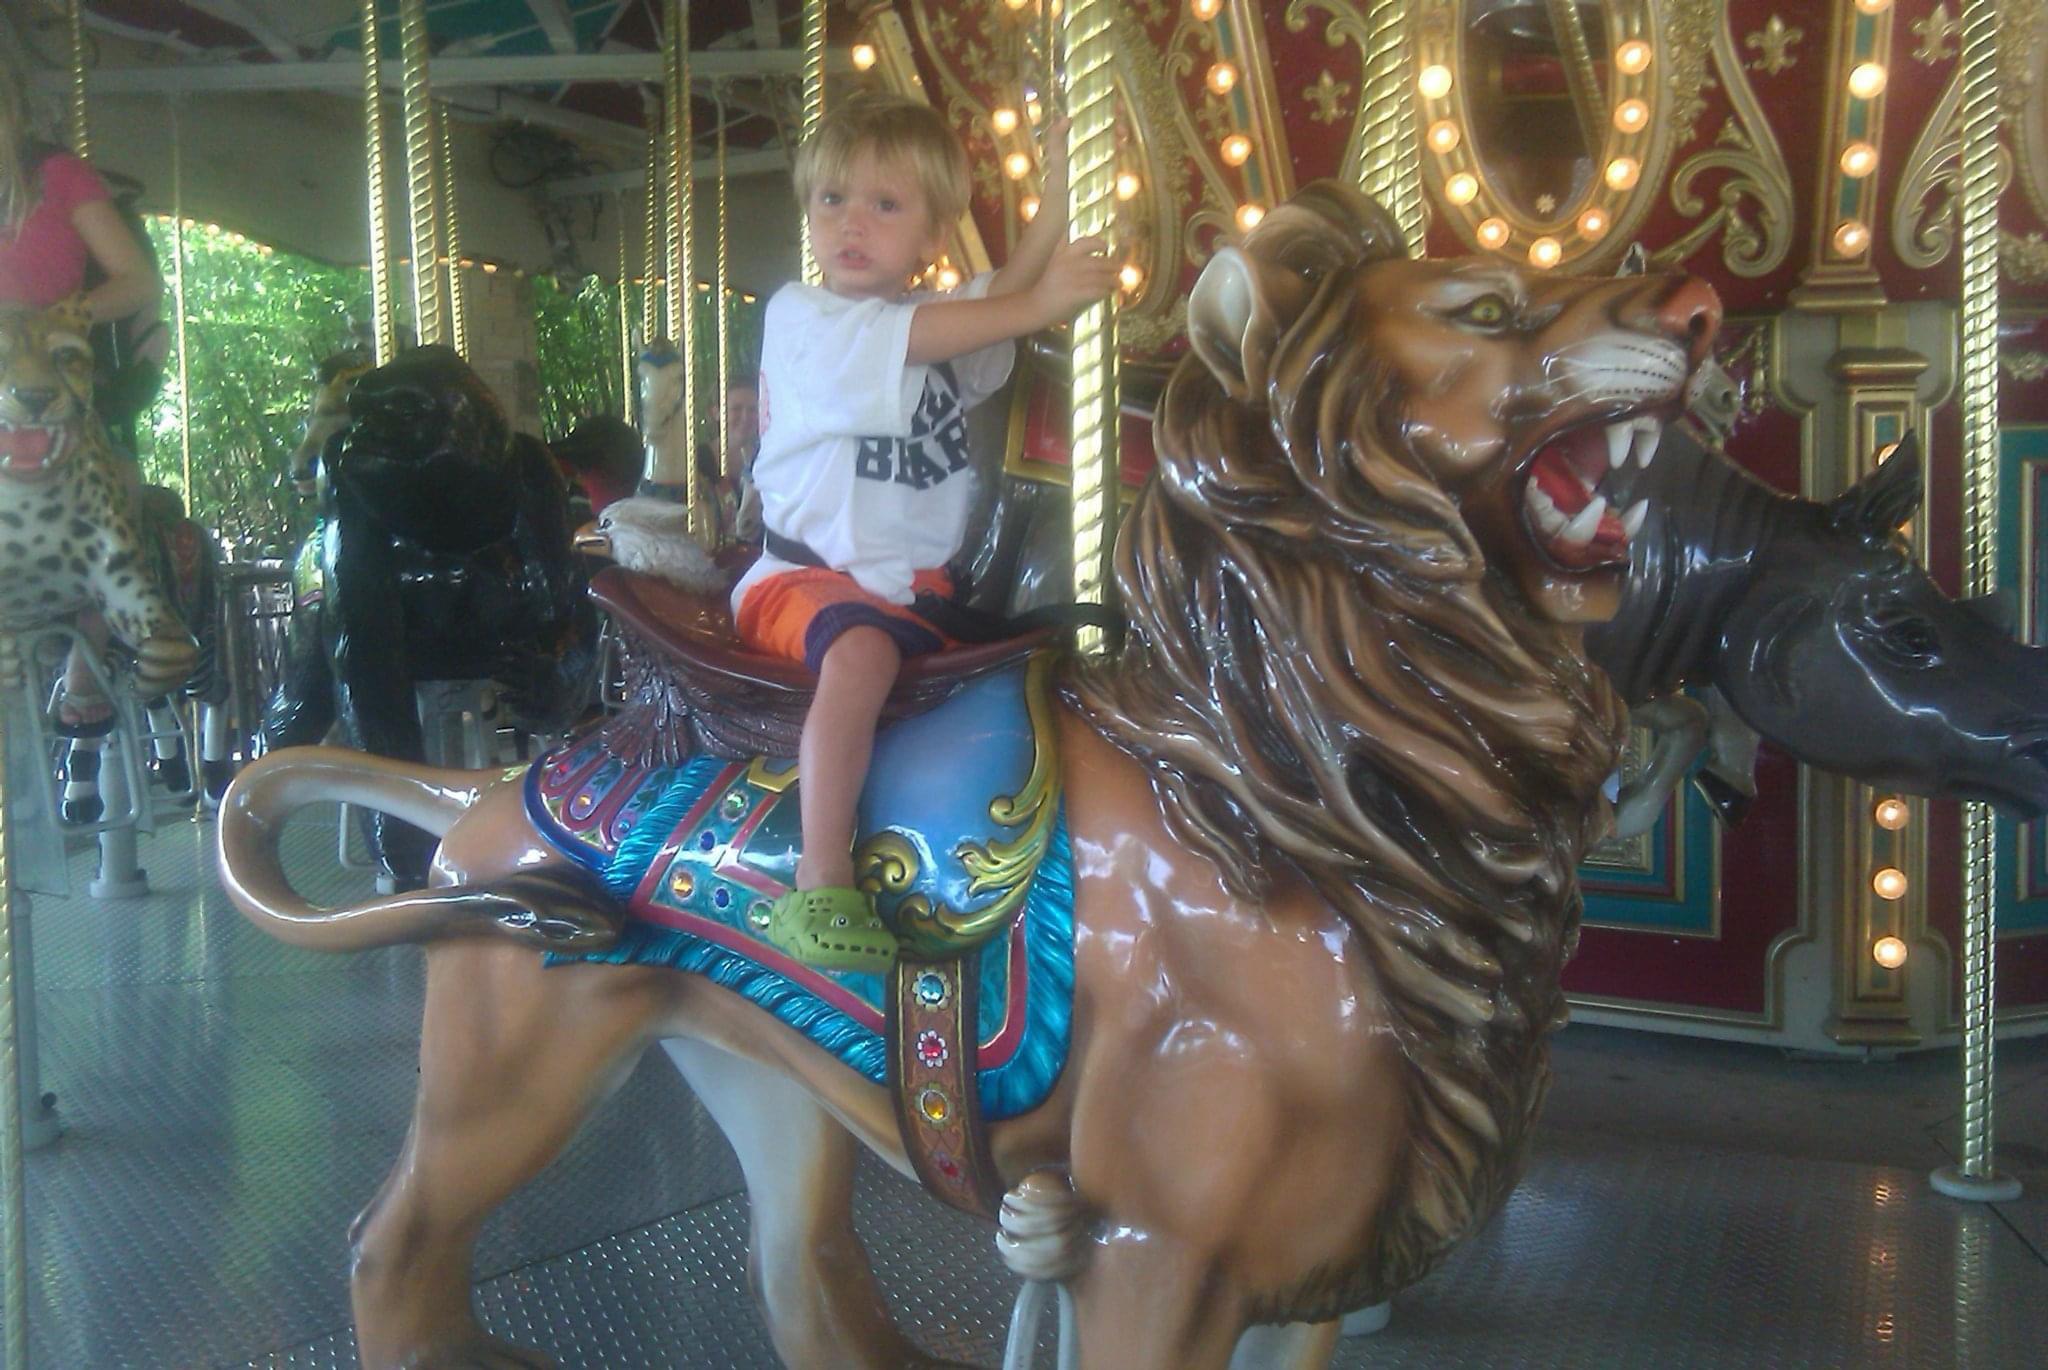 Carousel ride at the Dallas Zoo Texas